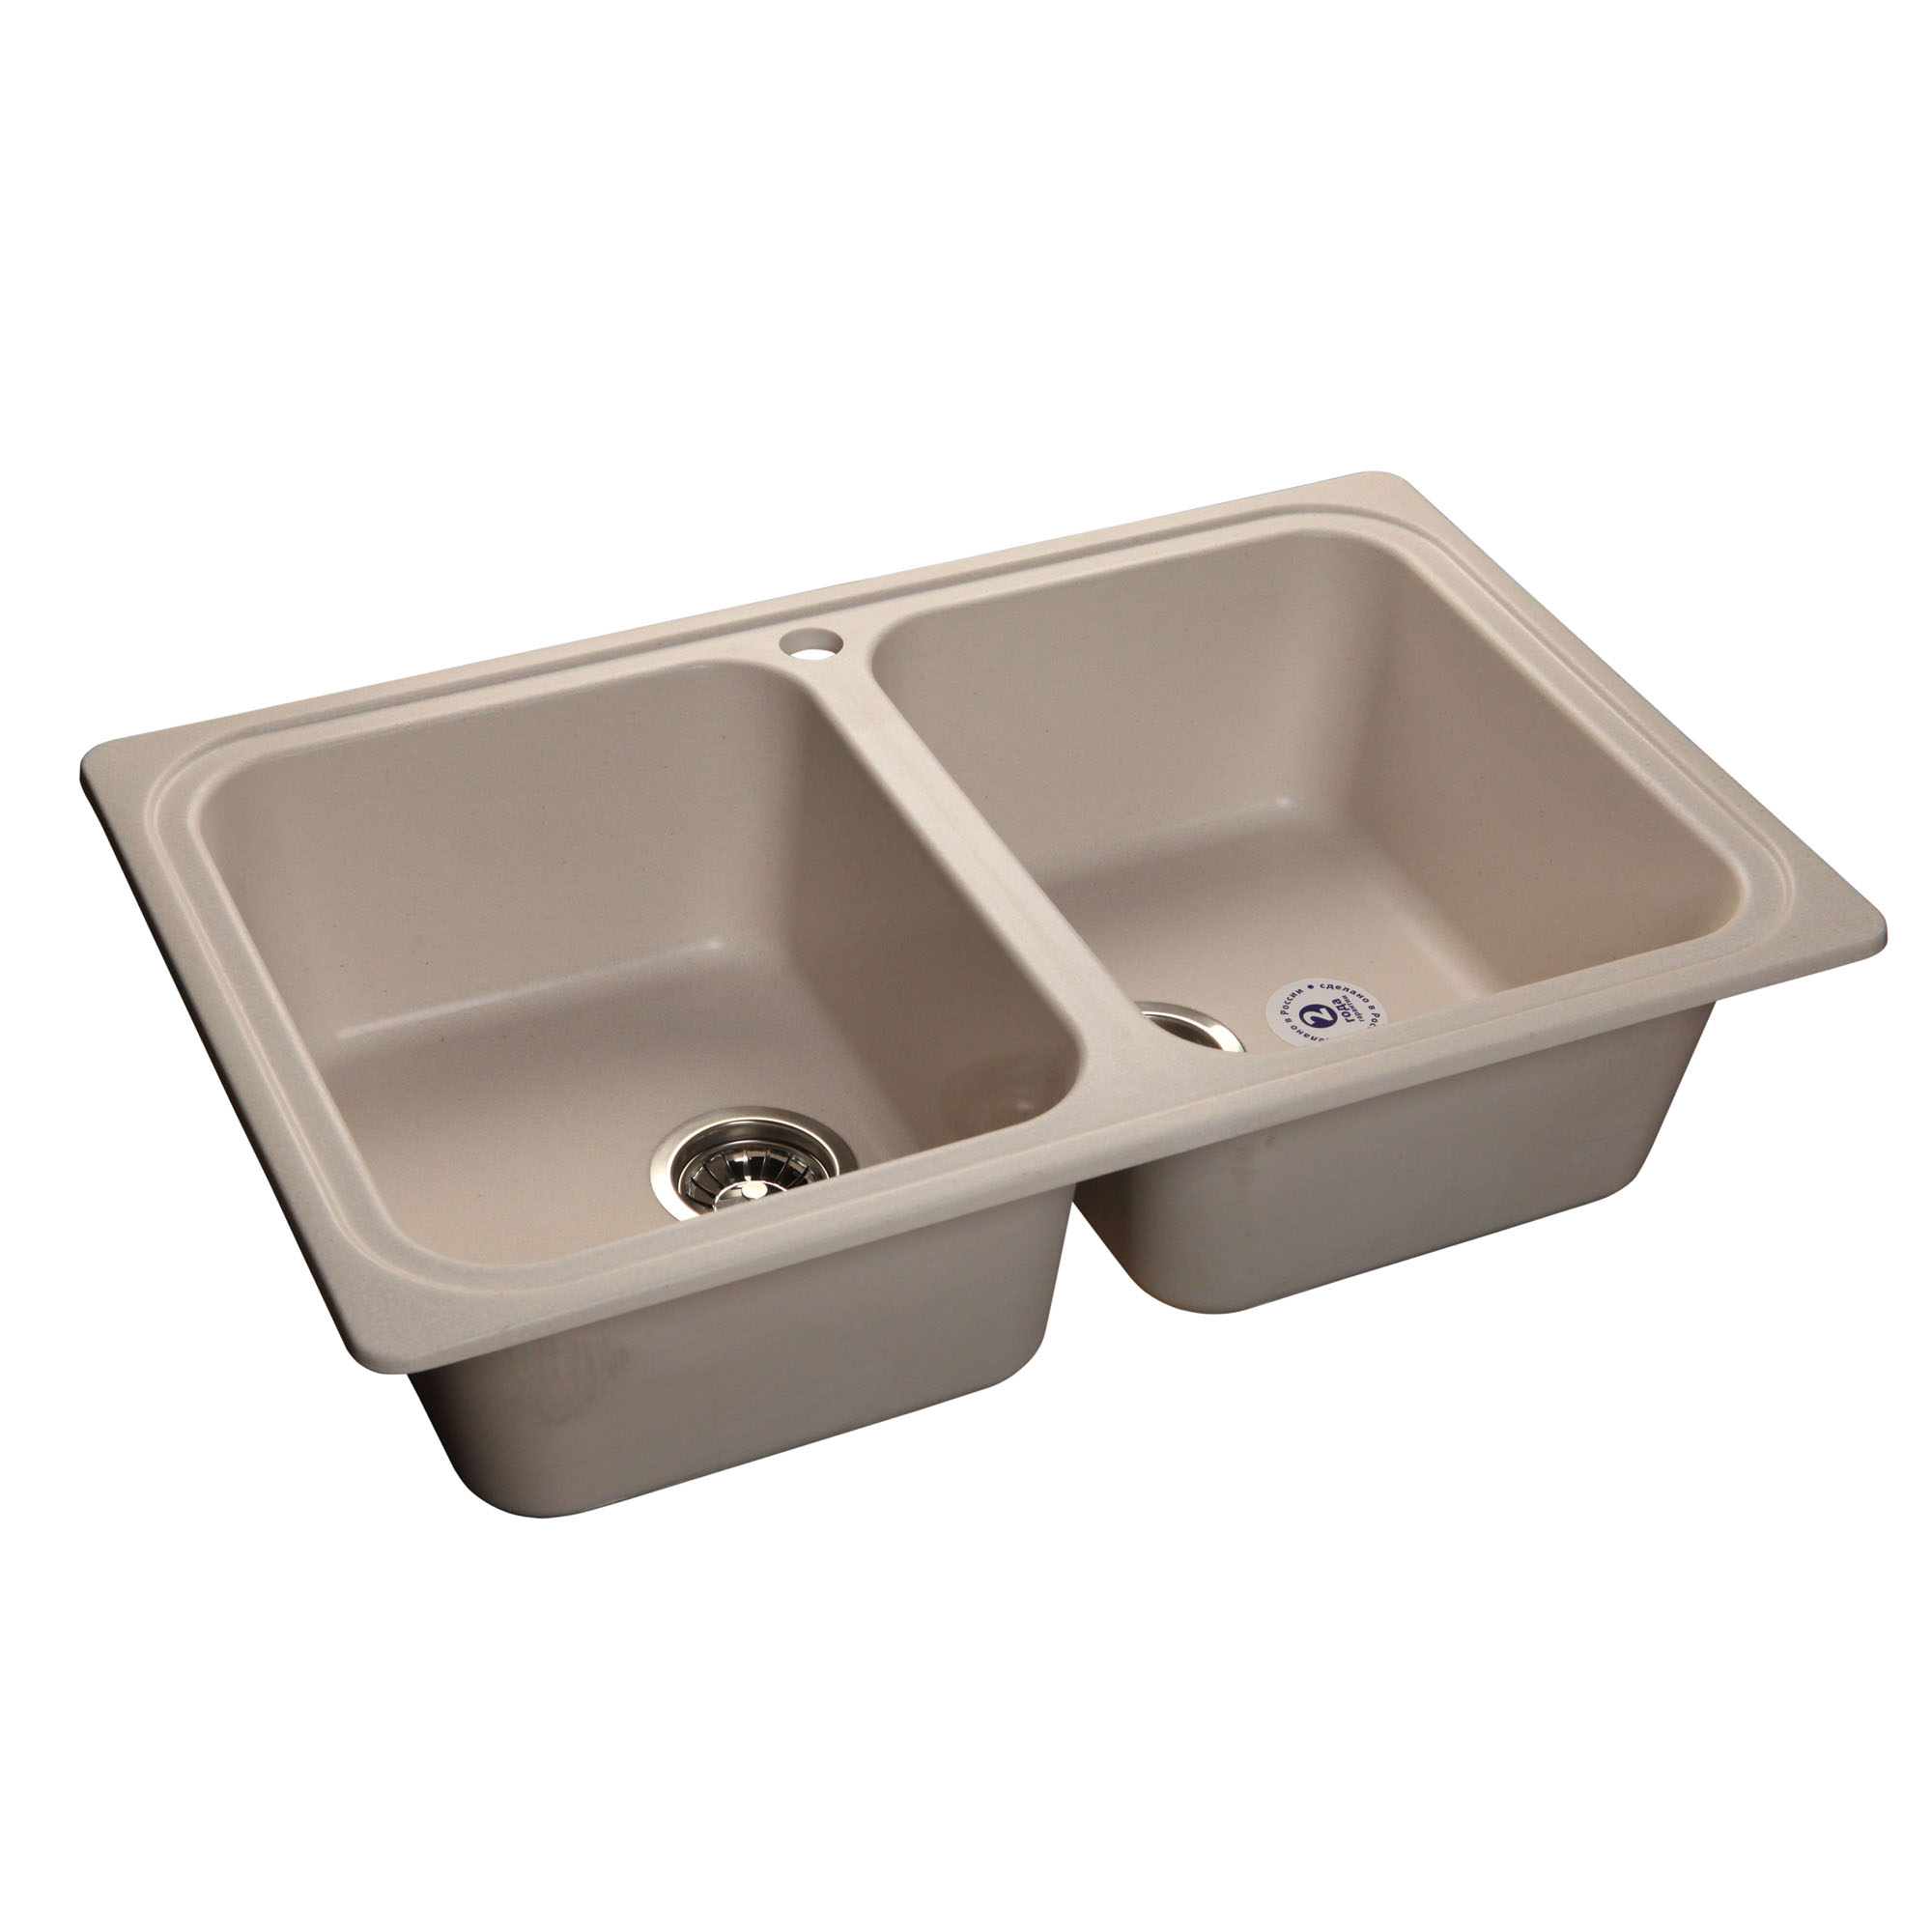 Кухонная мойка GranFest Standart GF-S780K белый мойка кухонная granfest гранит 780x510 gf s780k бежевая